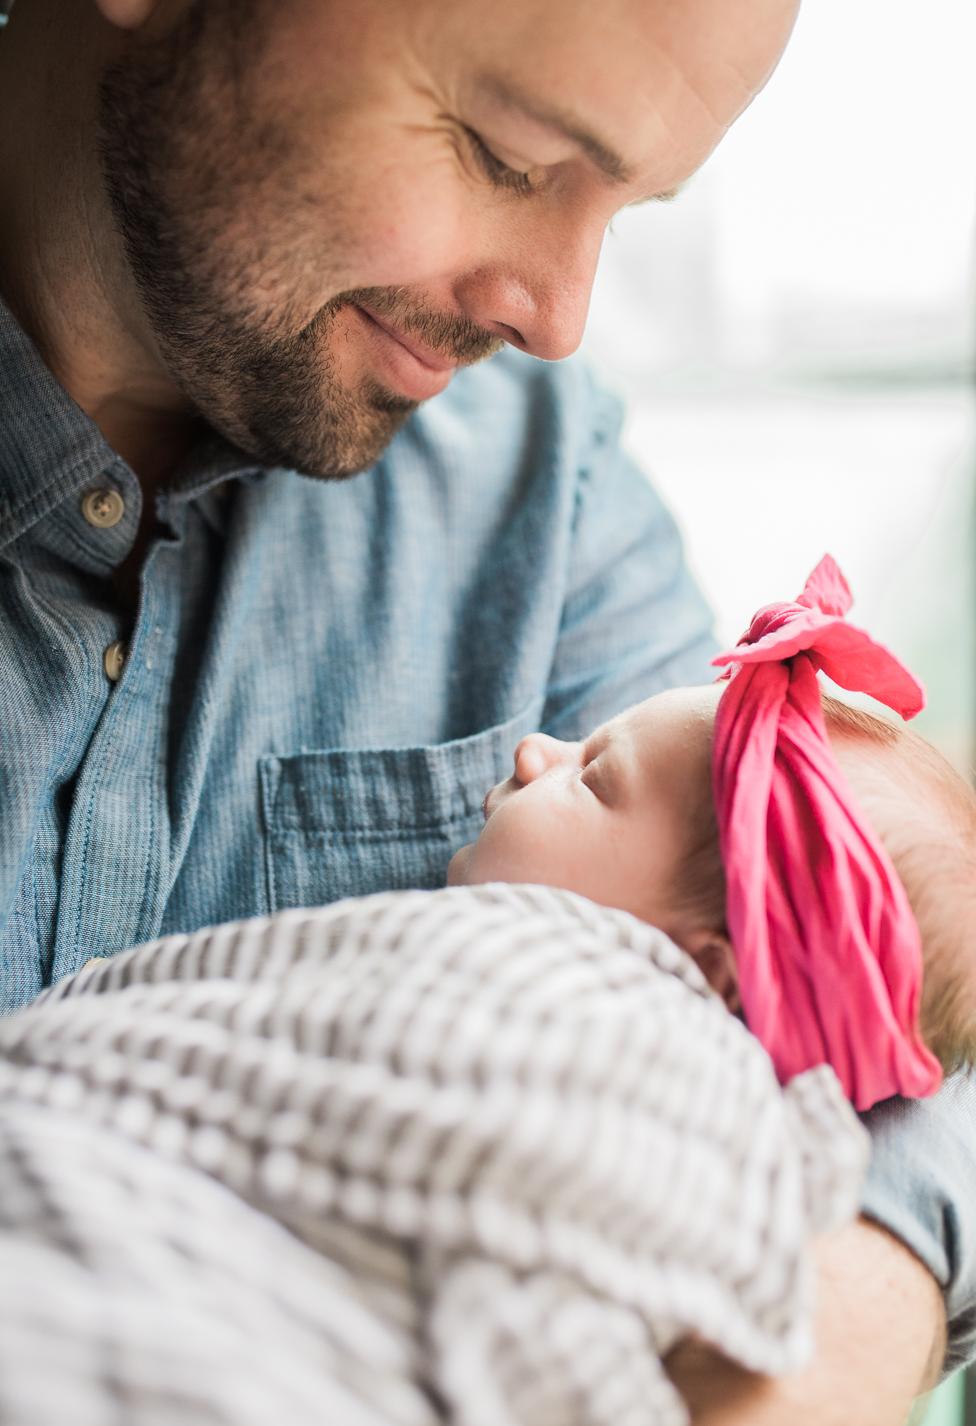 Newborn-photographer-BKLP-Baltimore-Maryland-Brooklyn-New York-lifestyle-photography-Breanna Kuhlmann-3.jpg